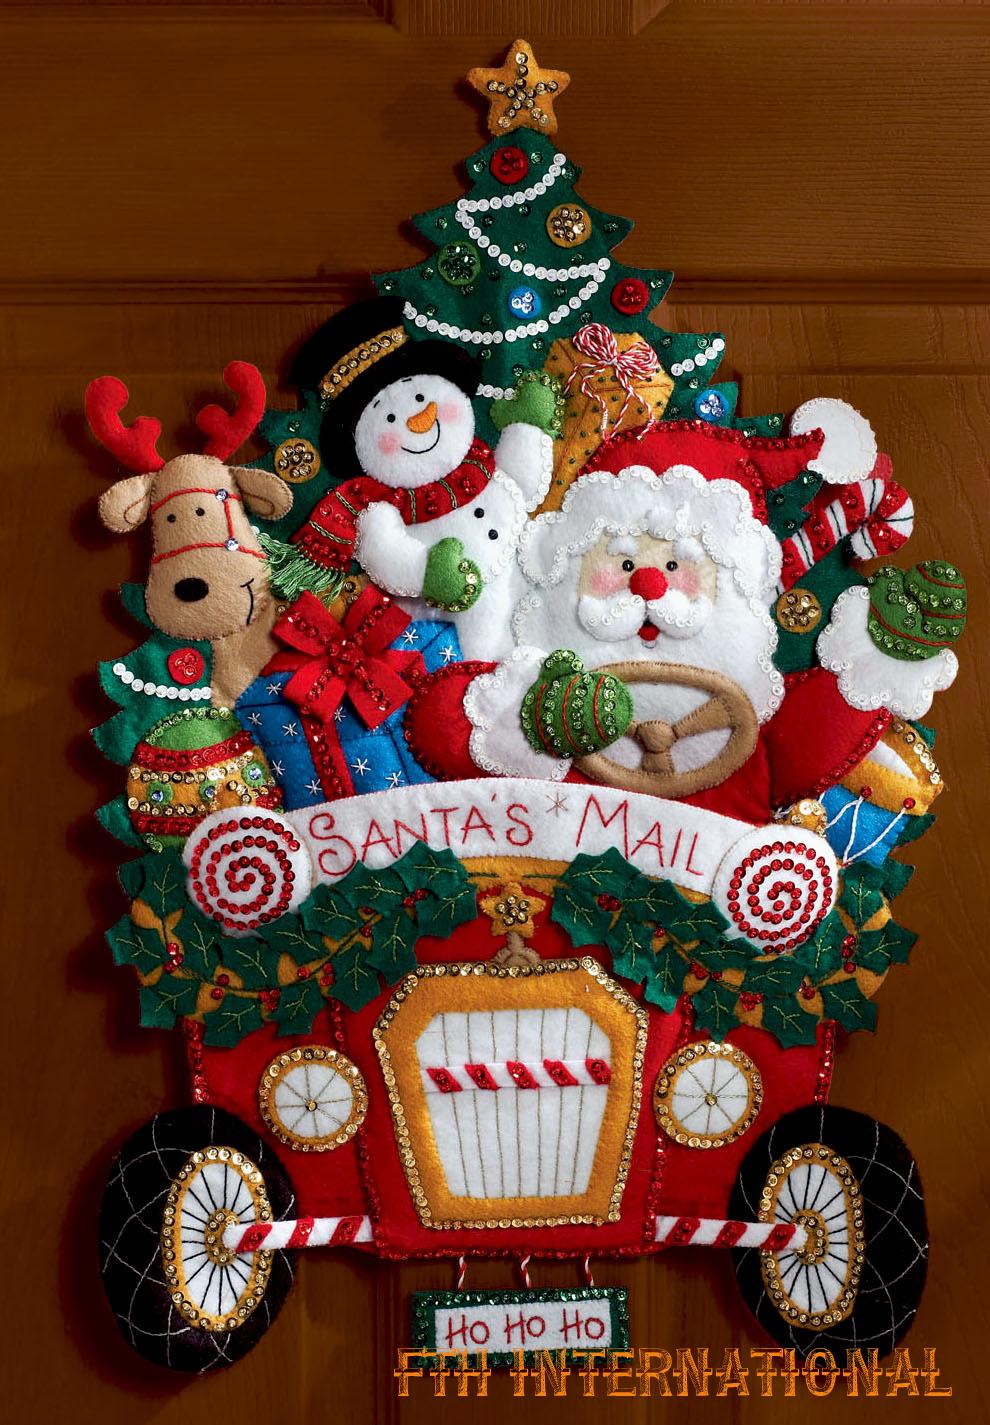 Santa S Christmas Mail Truck Bucilla Felt Wall Hanging Kit